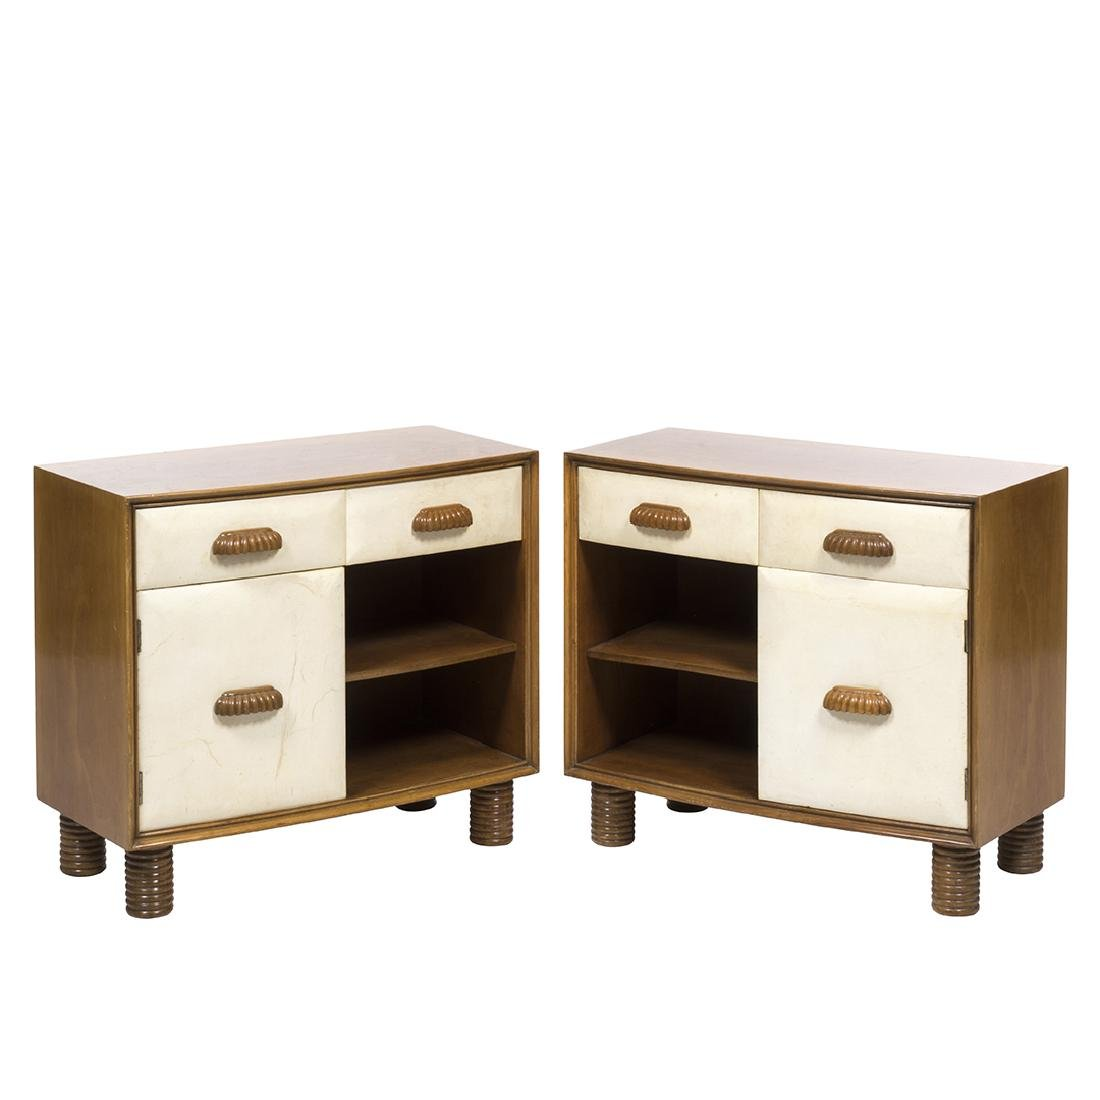 Osvaldo Borsani Bedside Cabinets (2)